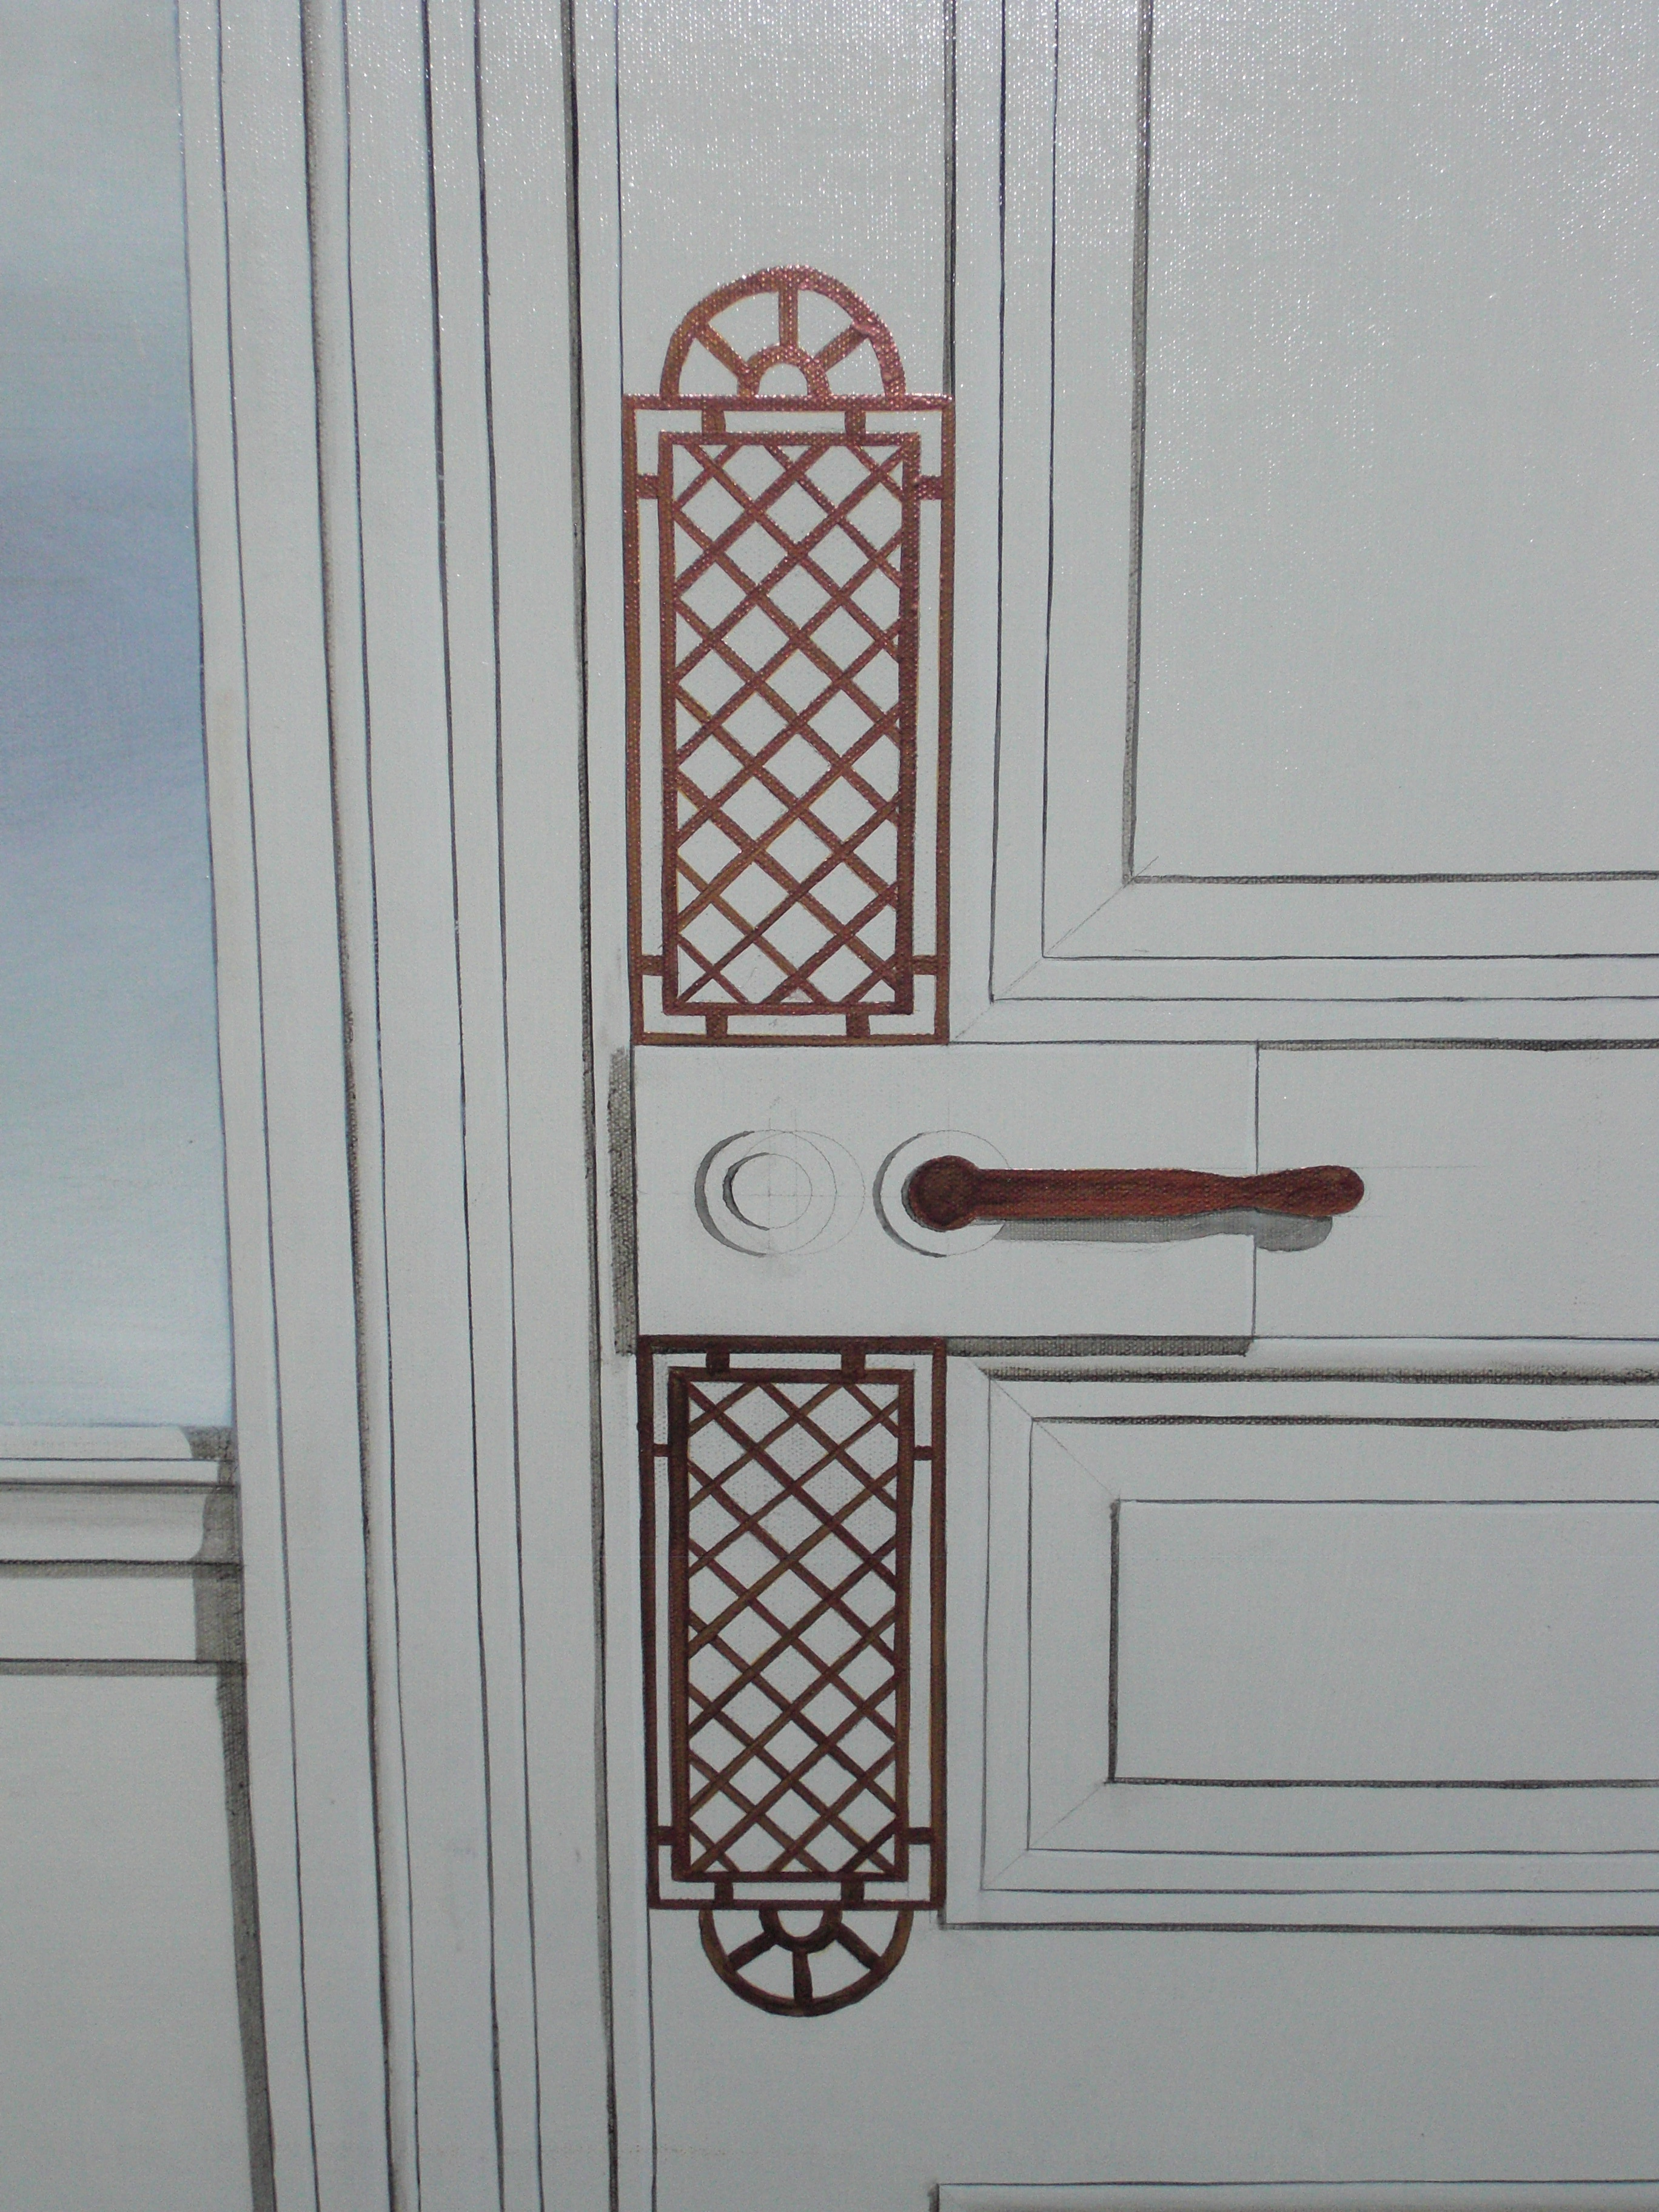 Slender Means - detail